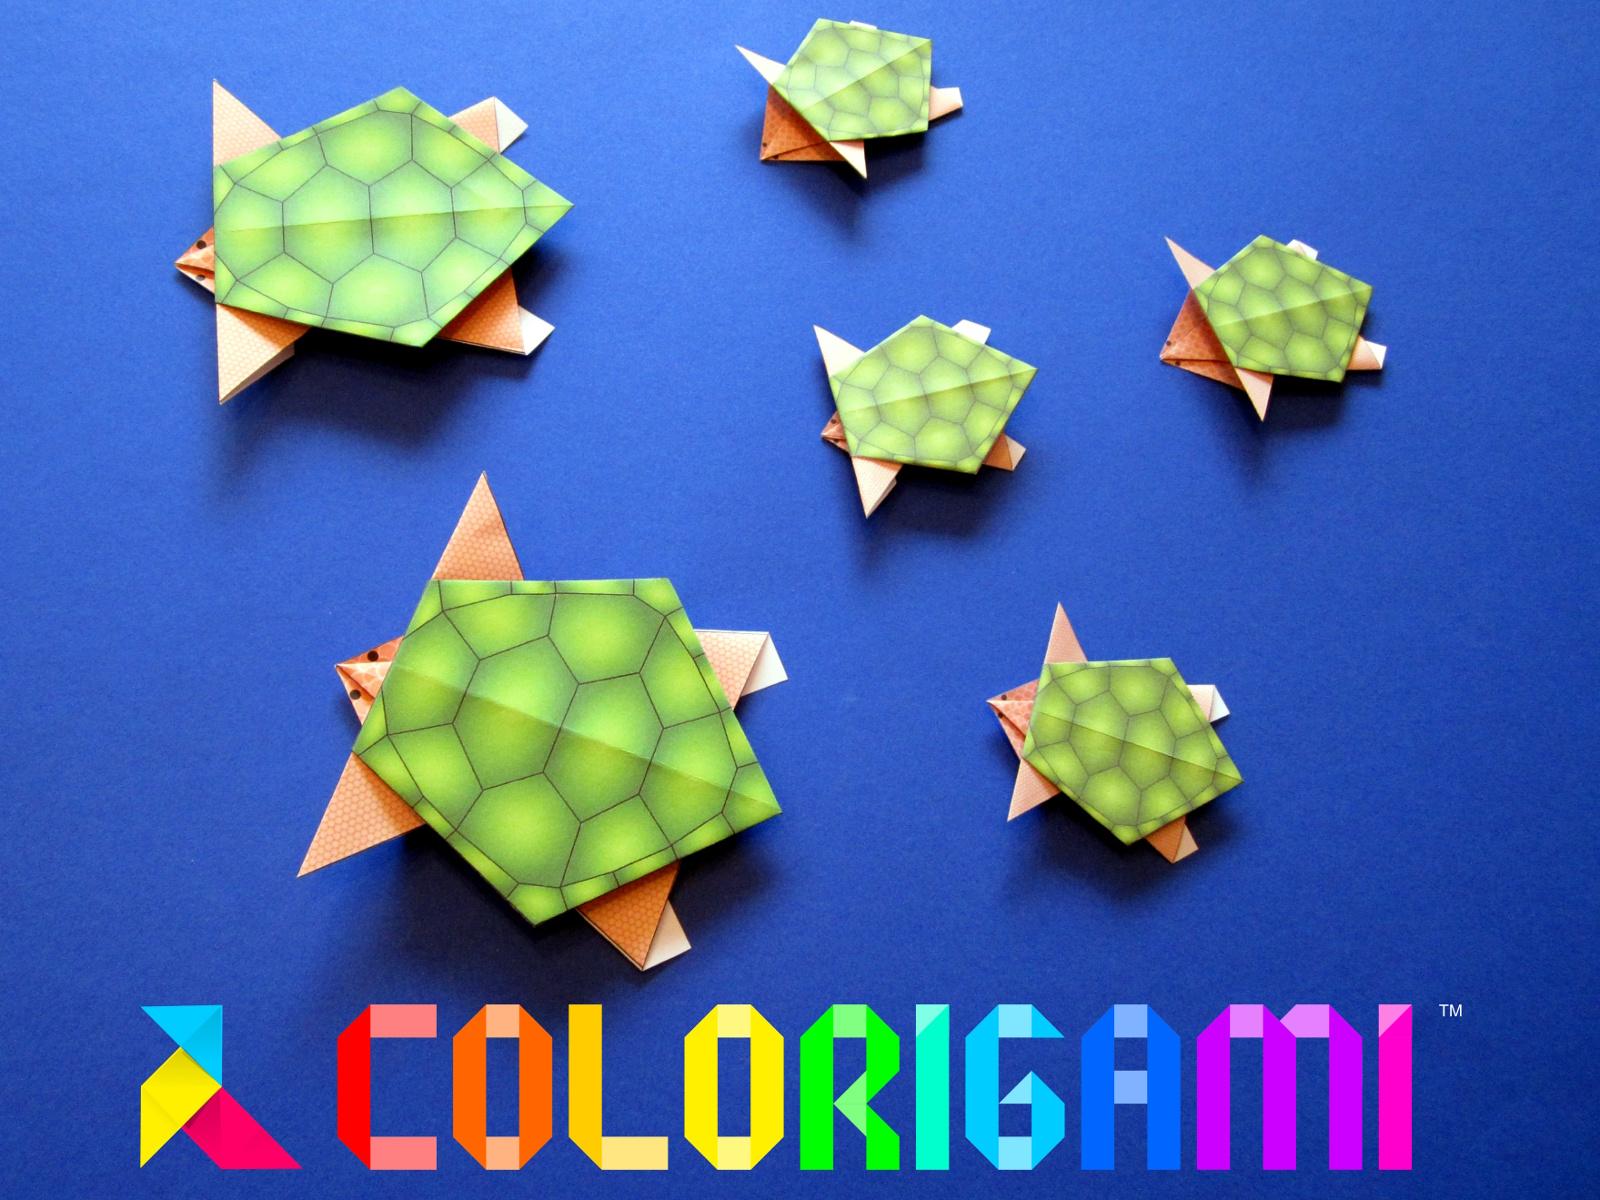 Colorigami